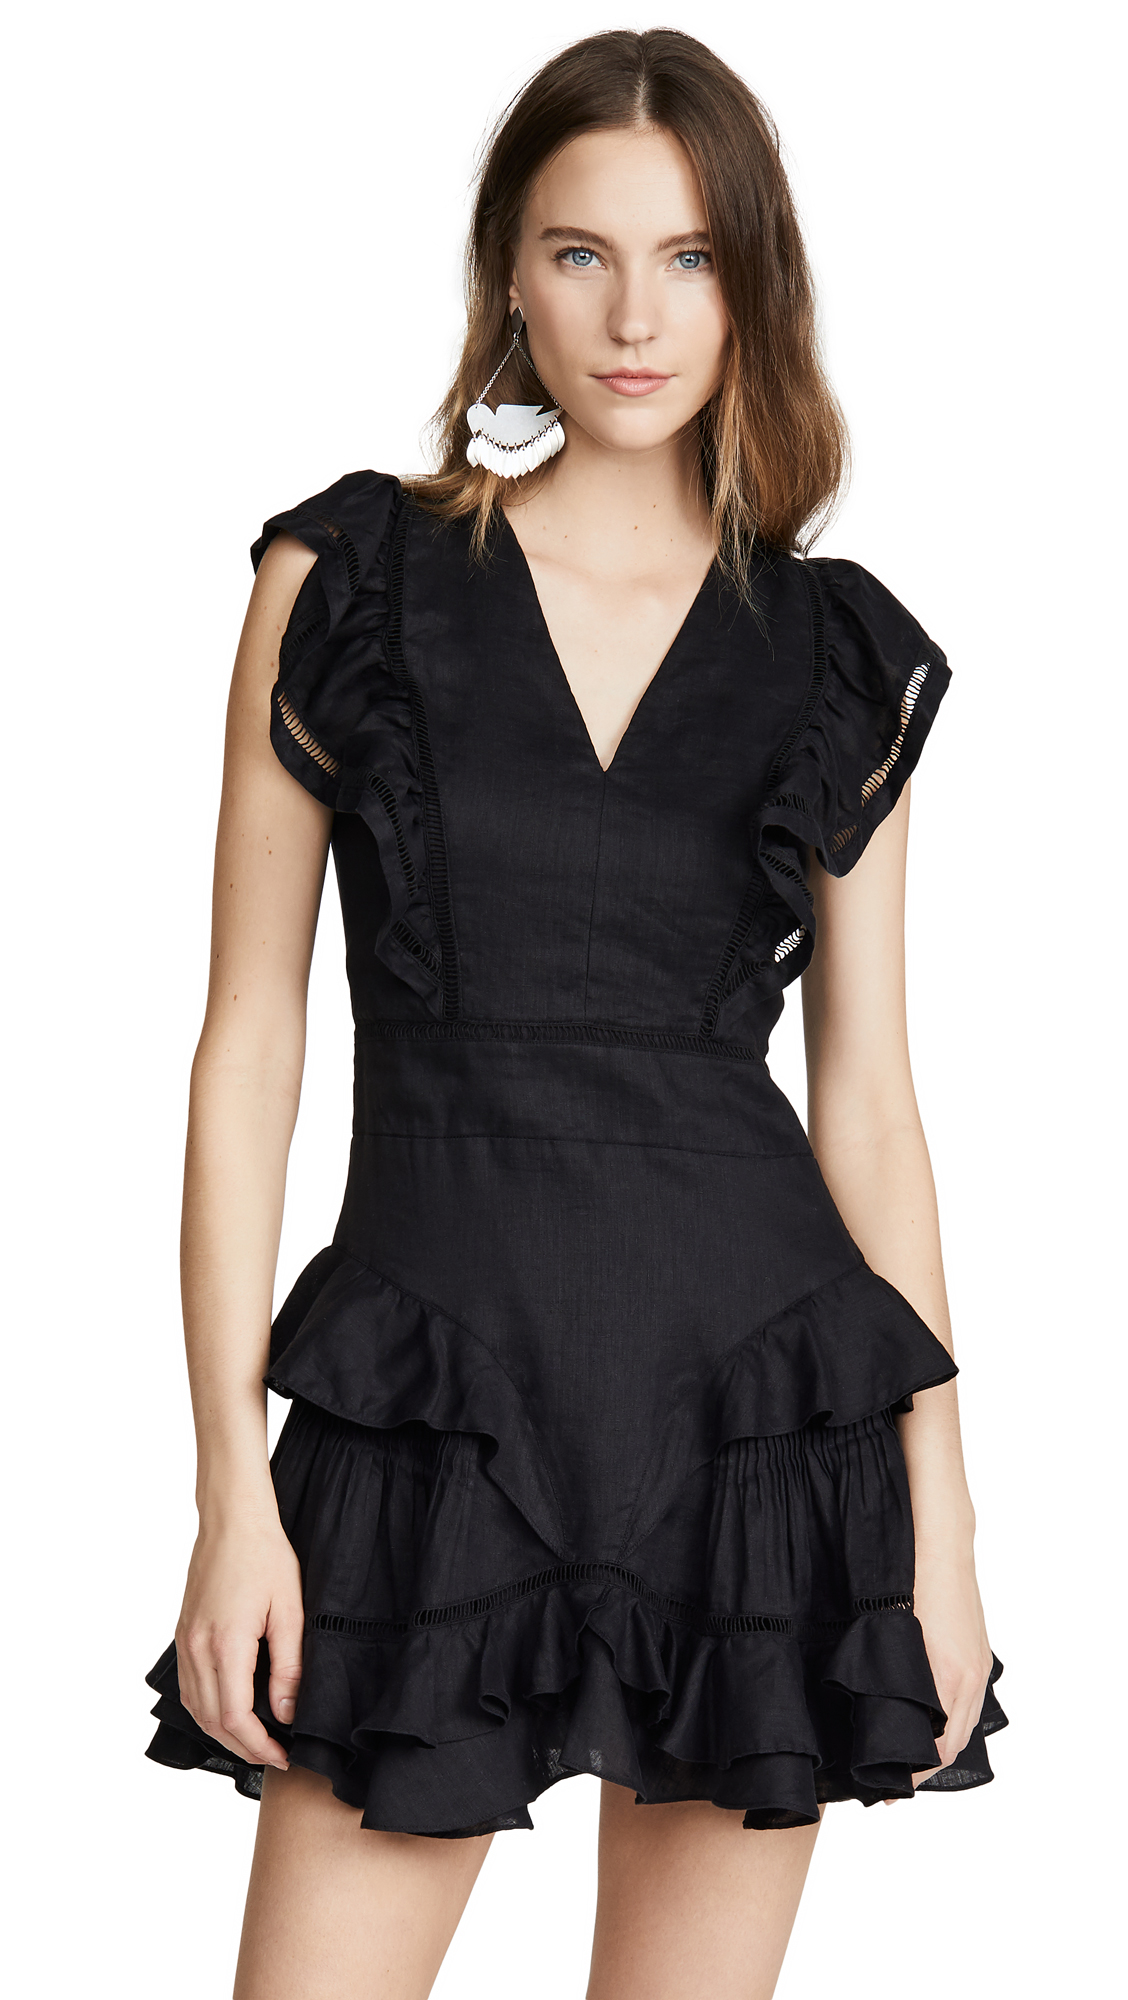 Isabel Marant Etoile Audrey Dress - 50% Off Sale